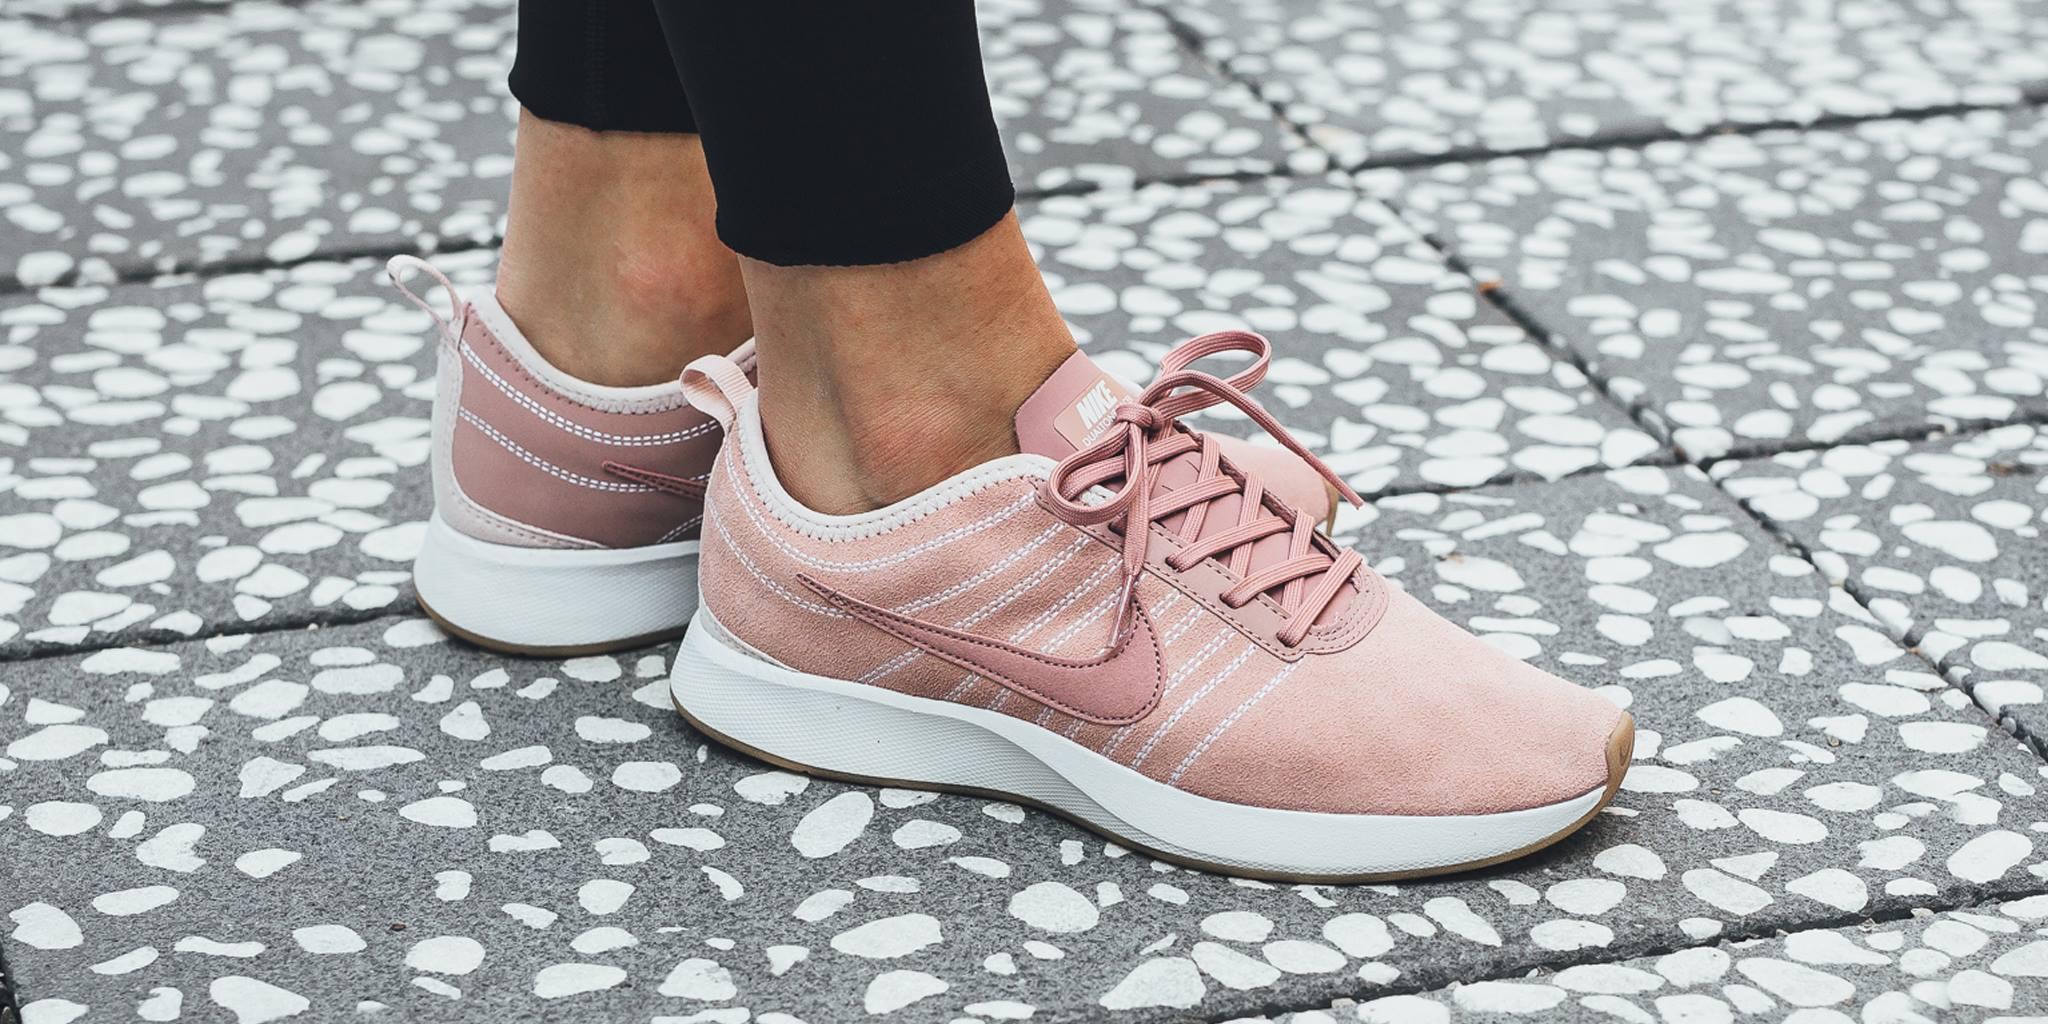 Nike Sportswear Air Max Plus TN 605112 603   Particle Pink